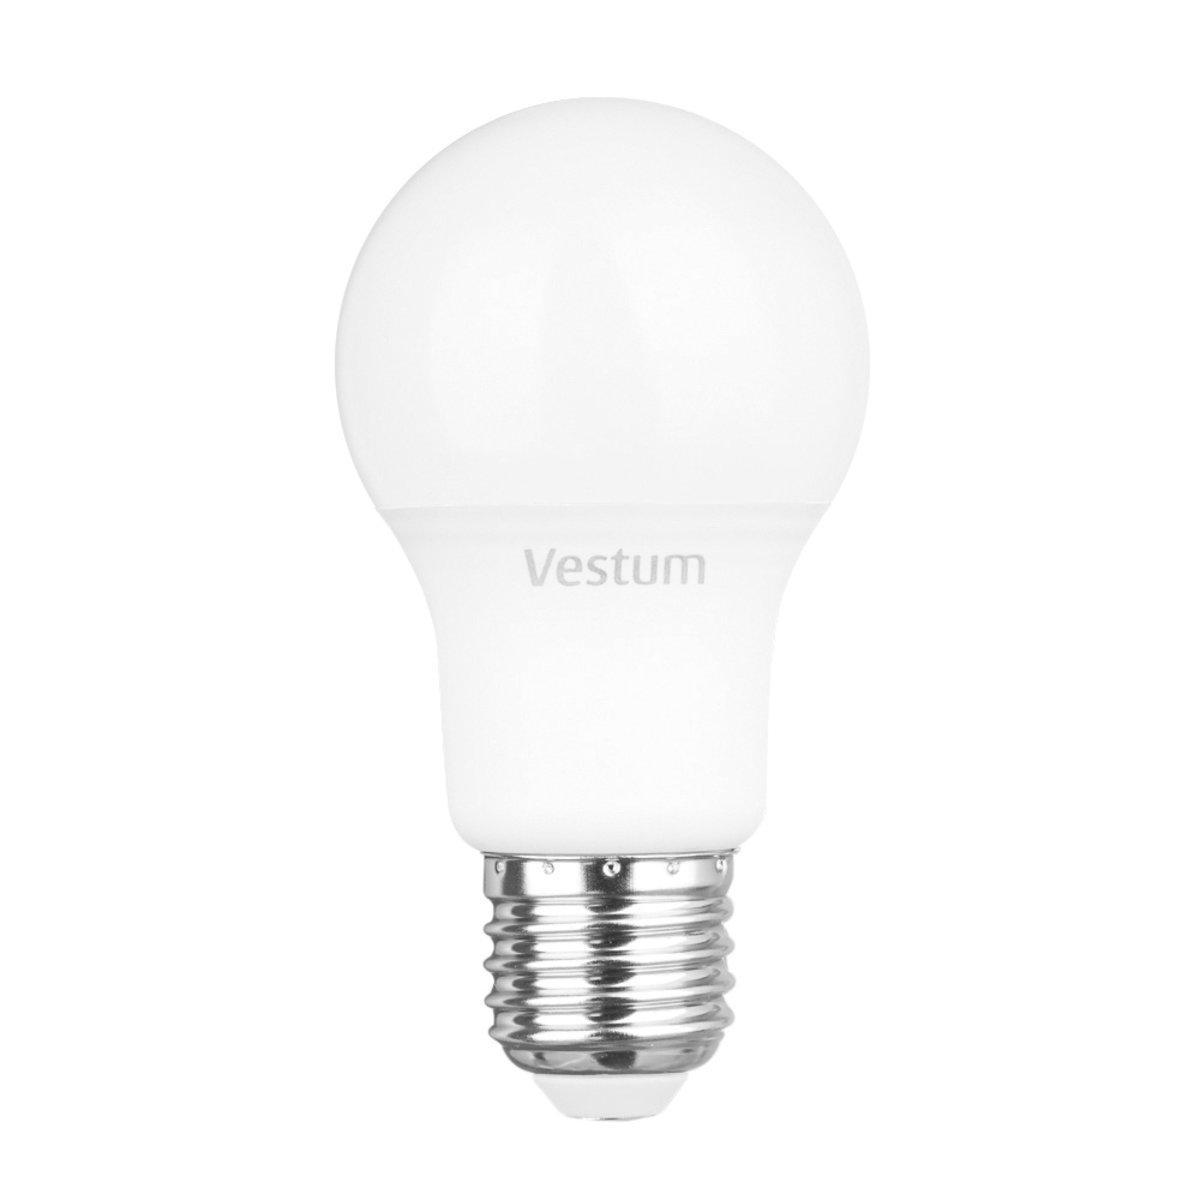 Лампа LED Vestum A55 8W 3000K 220V E27